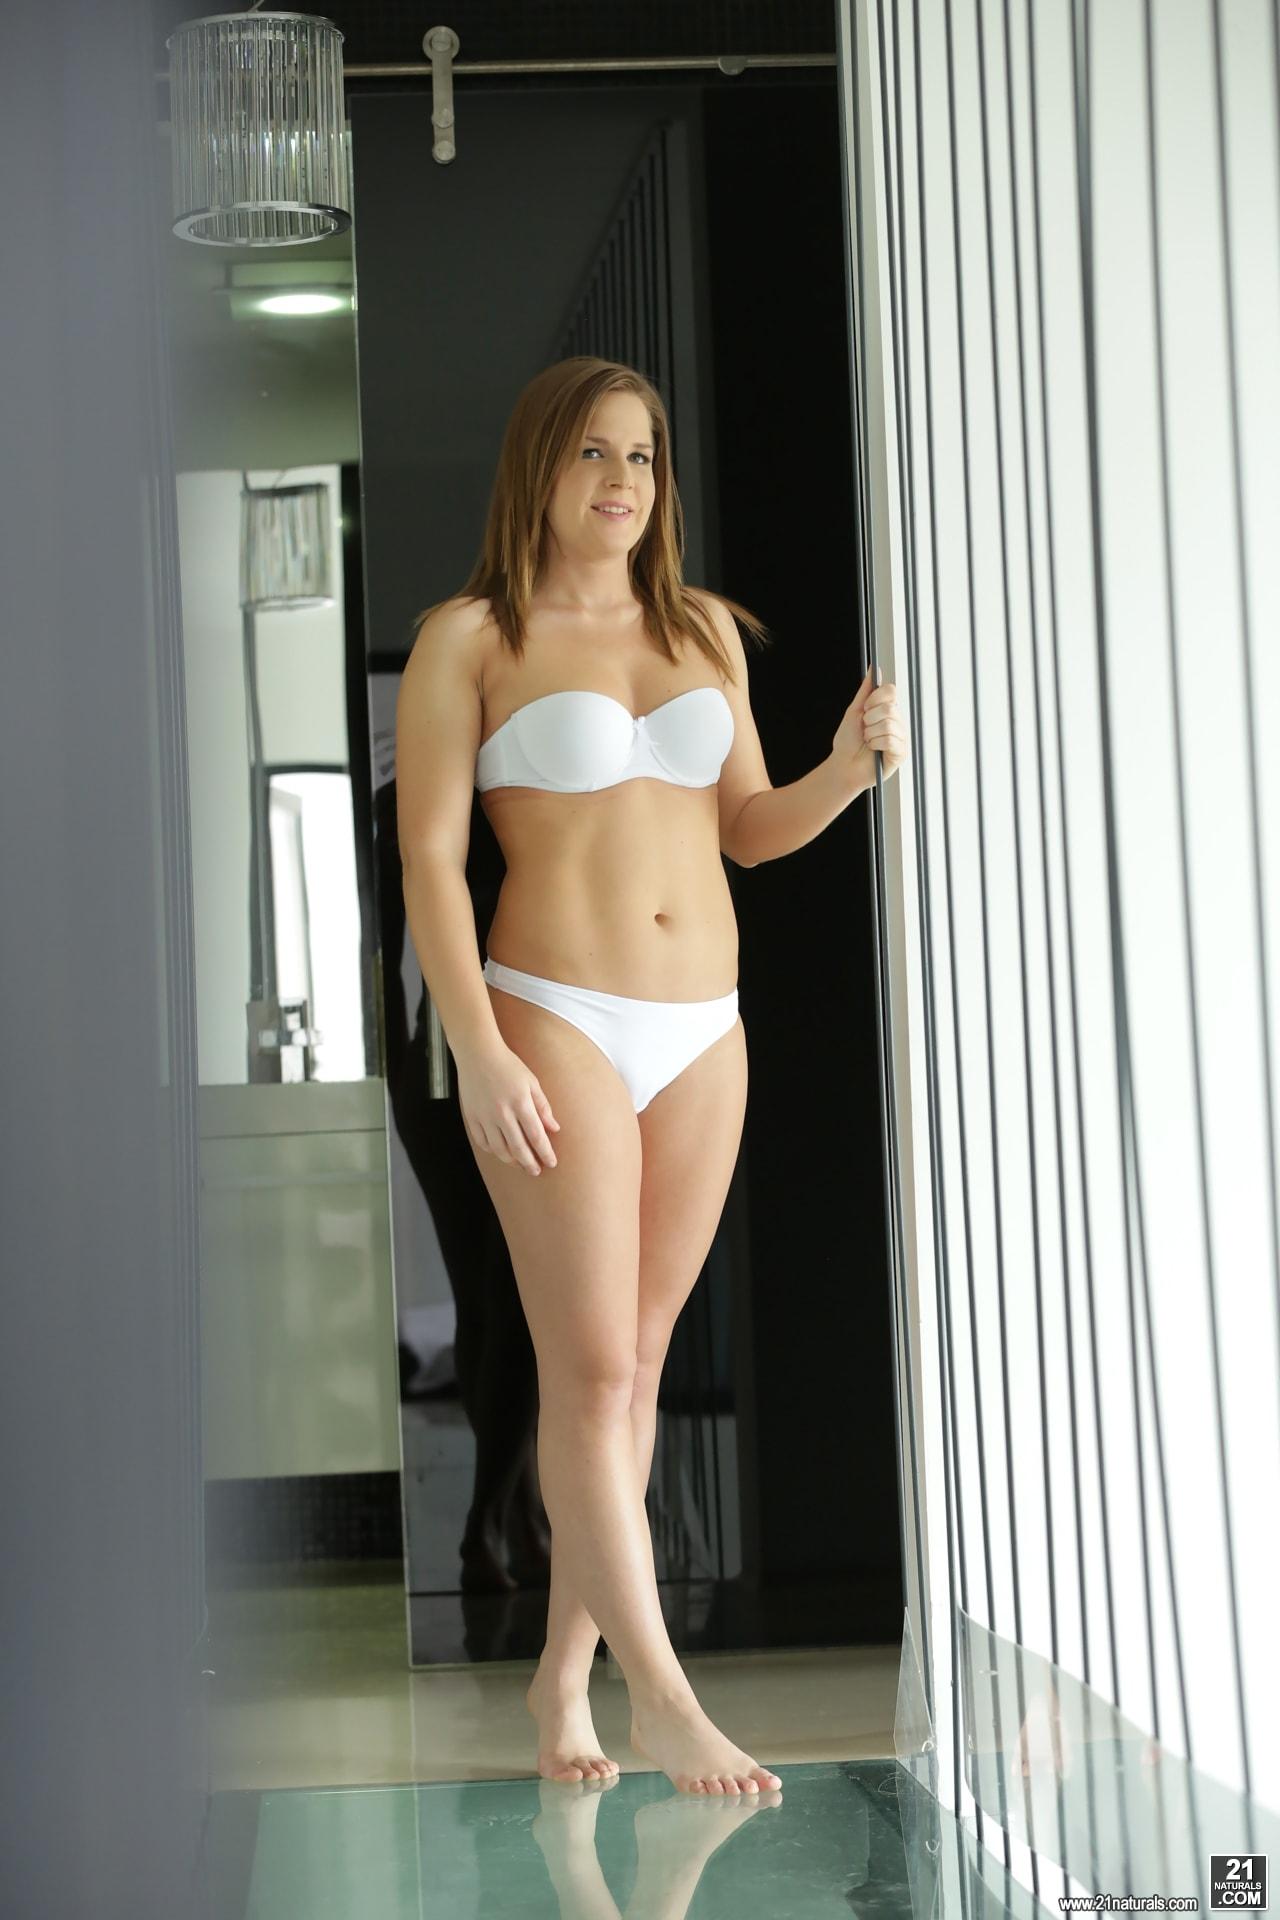 21Sextury 'A Sweet Wake Up' starring Cara Wolf (Photo 1)